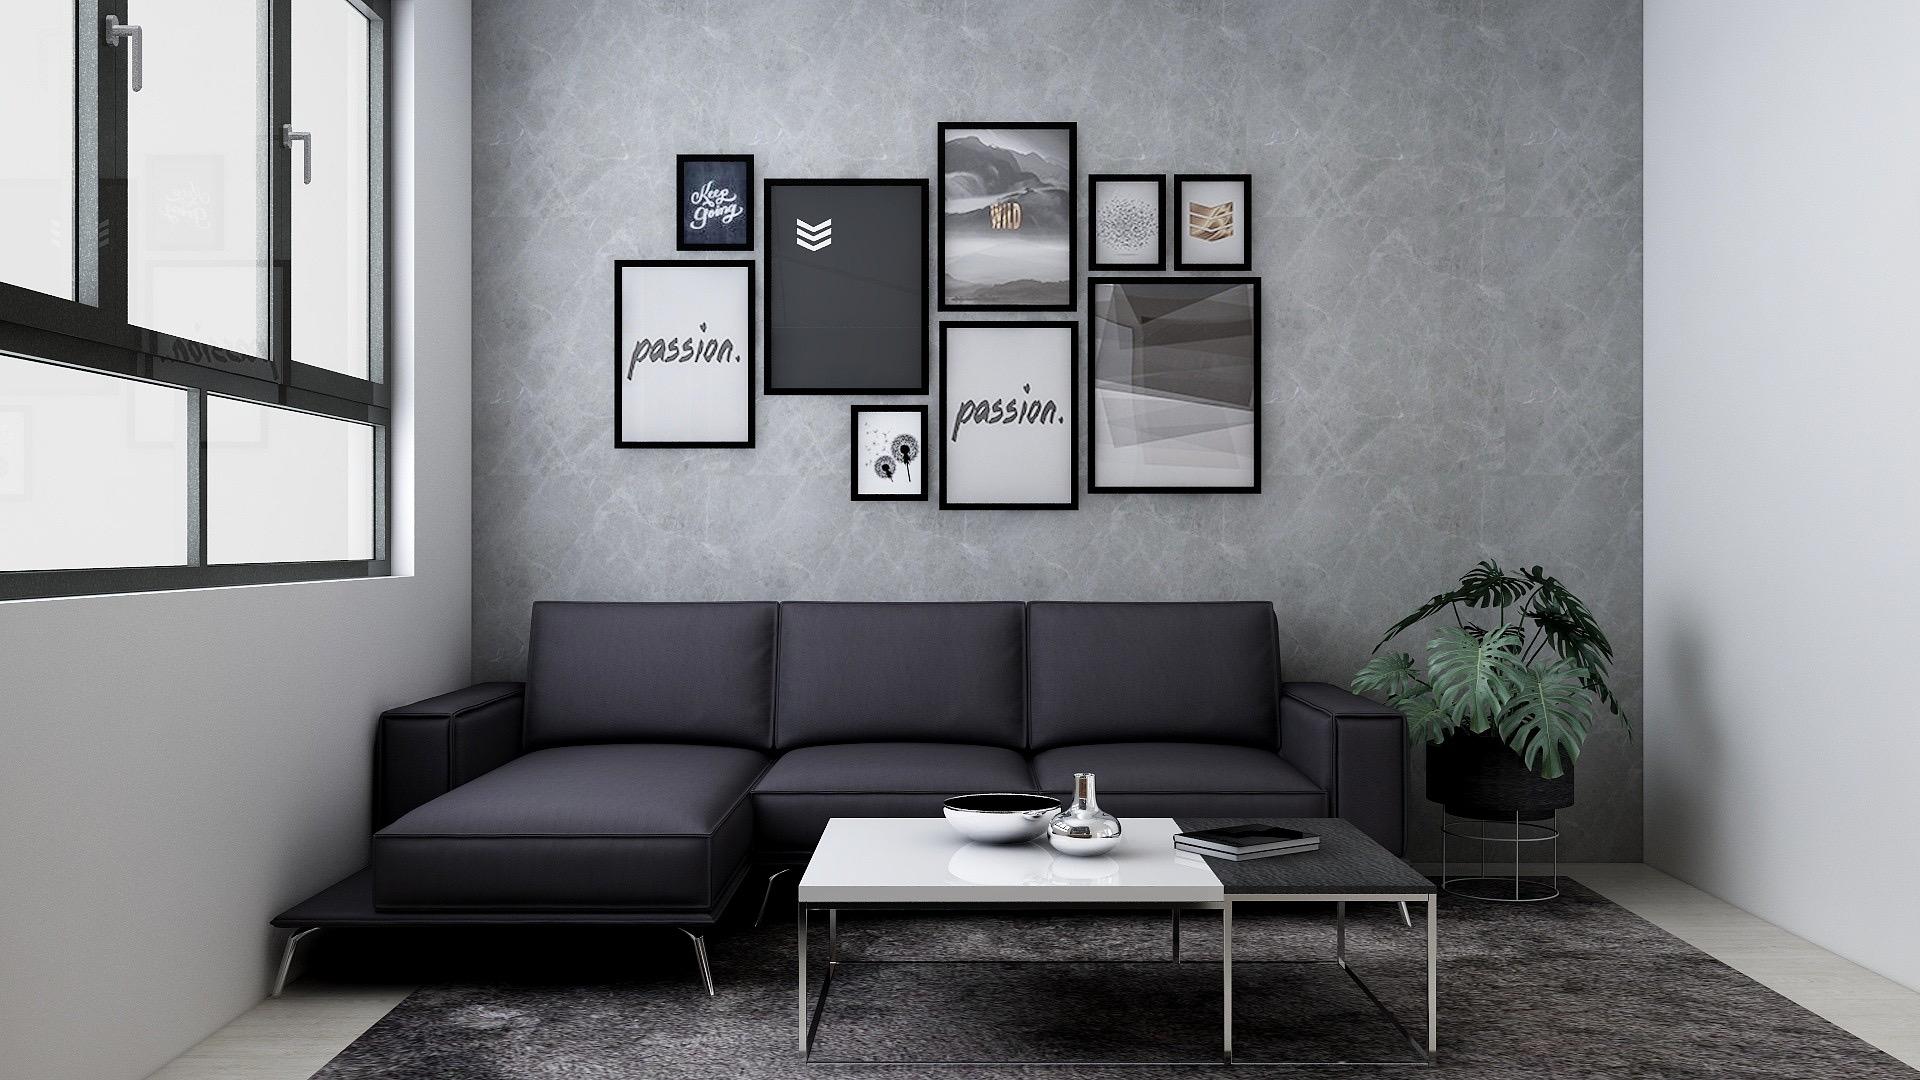 Monochromatic gray color scheme in a Contemporary living room